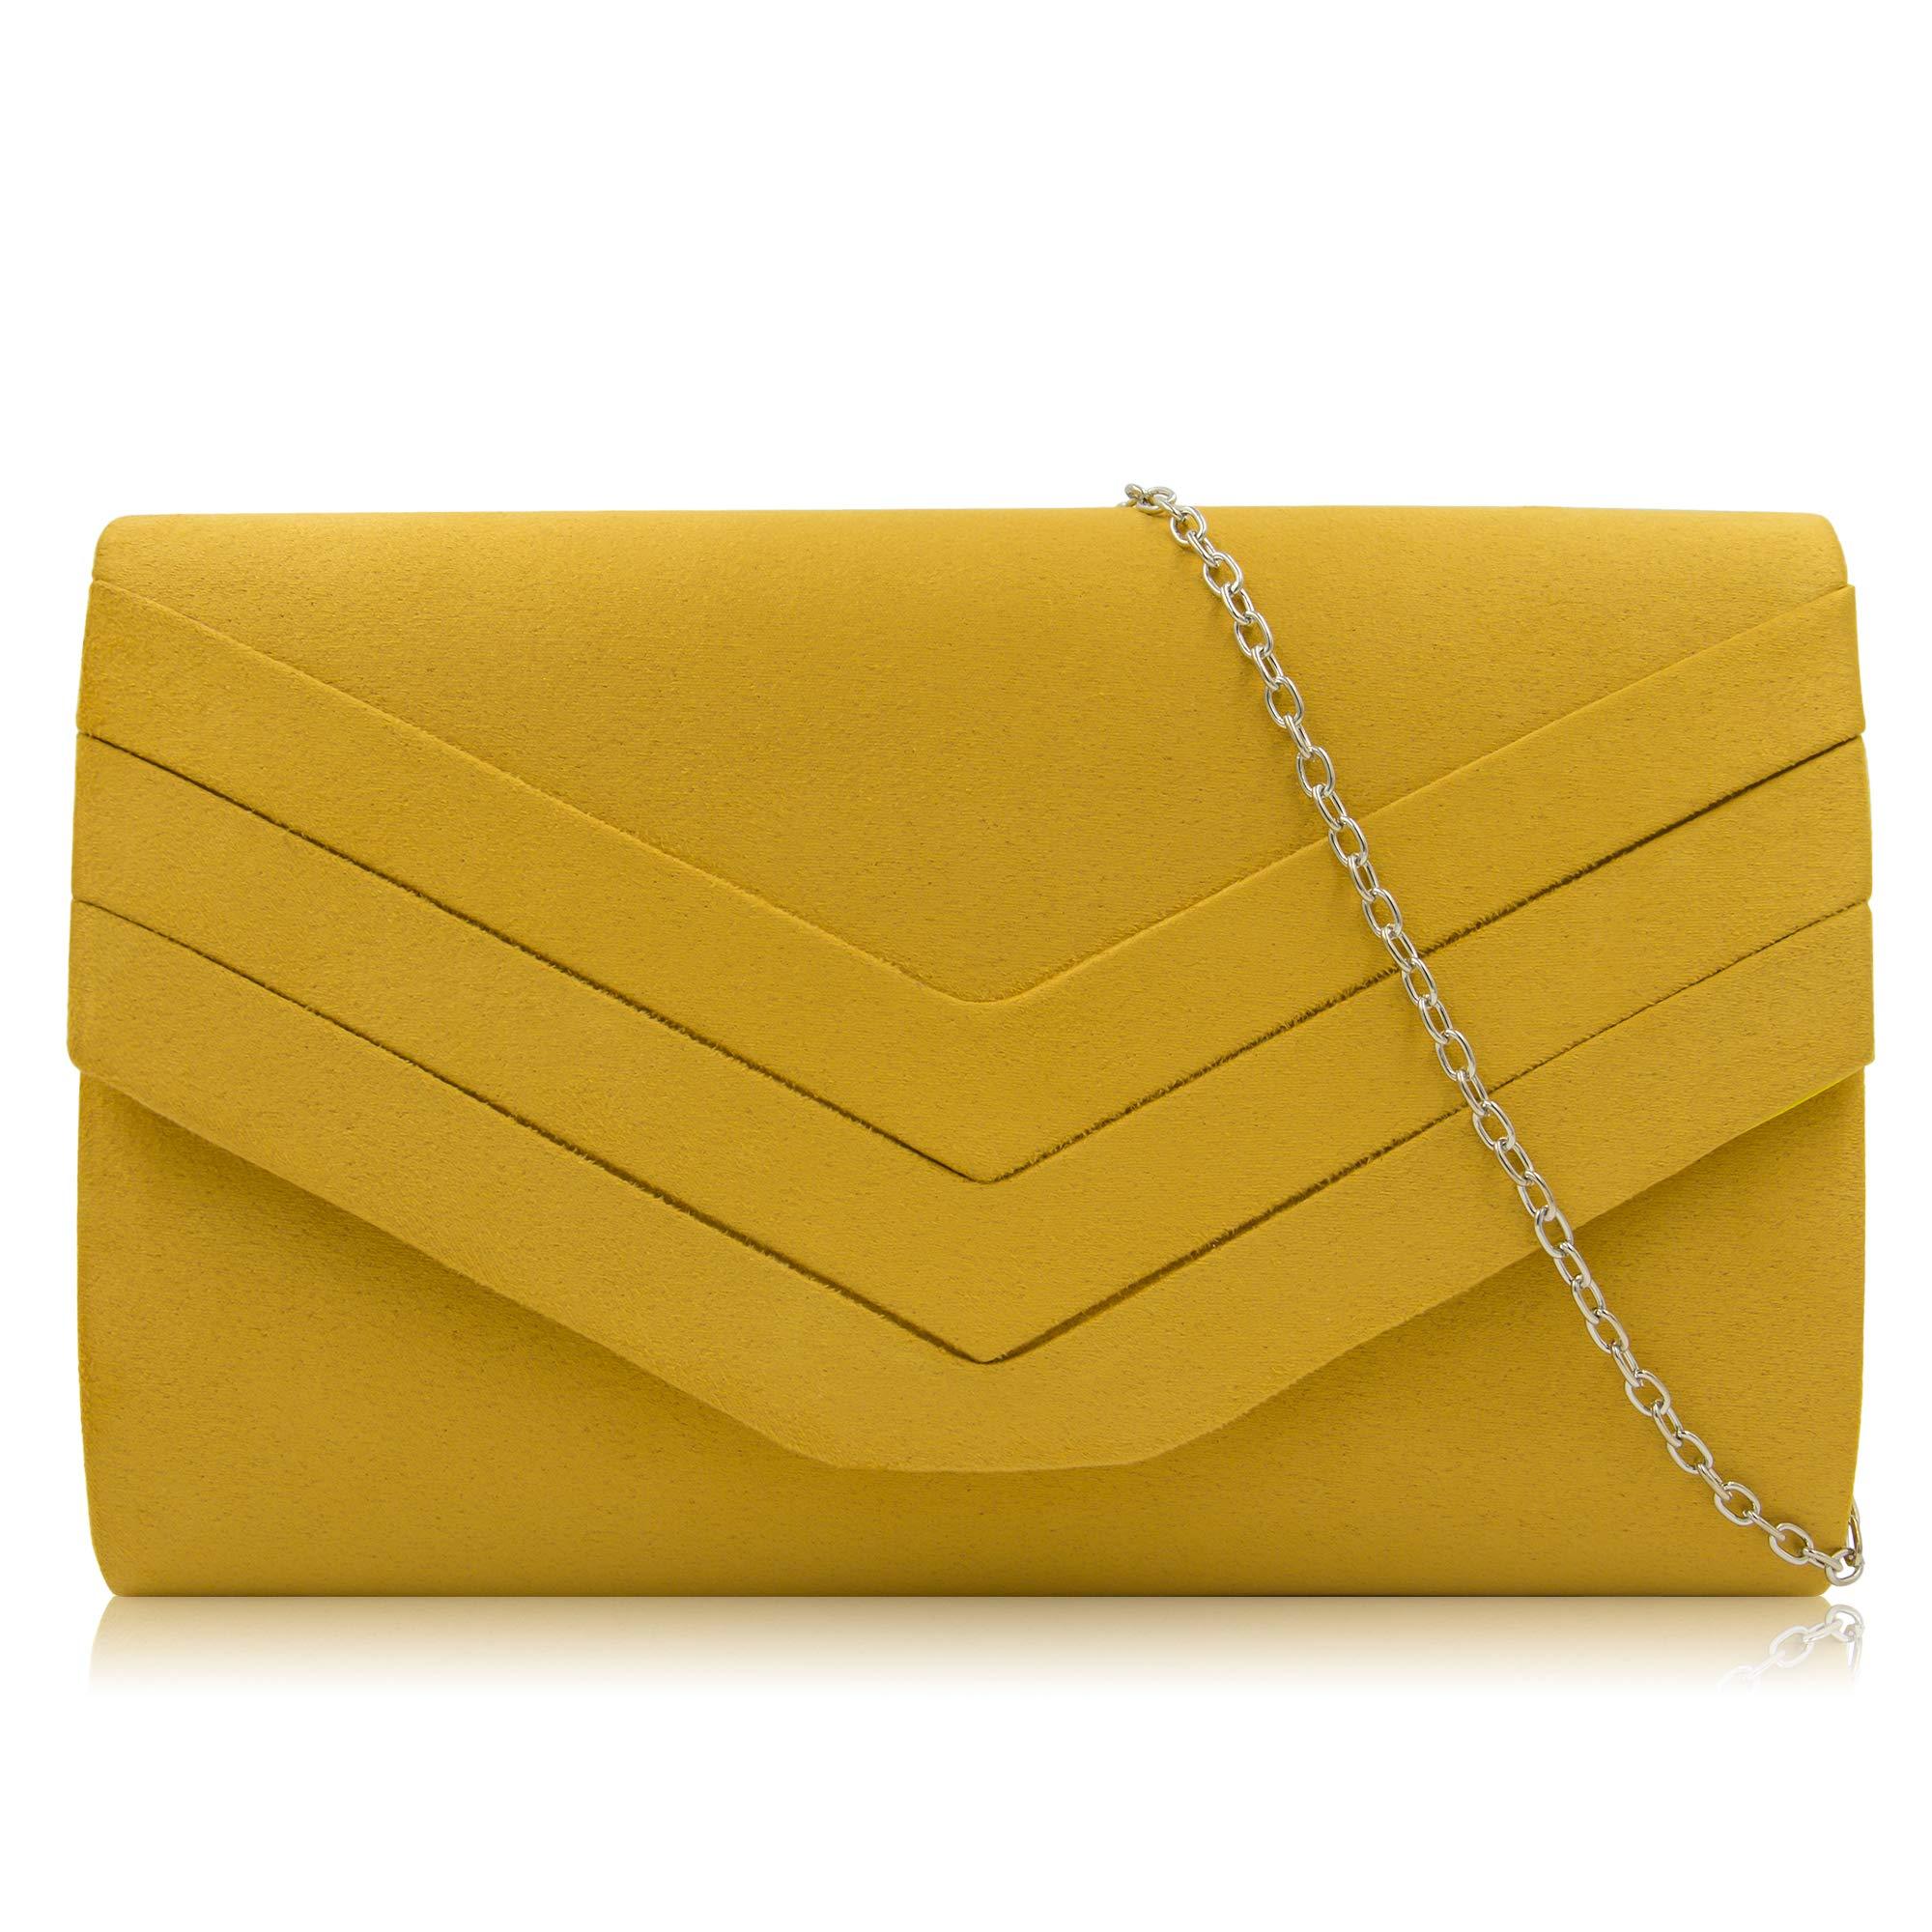 Milisente Women Clutches Velvet Evenlope Evening Bag Classic Clutch Purse (Banana Yellow)